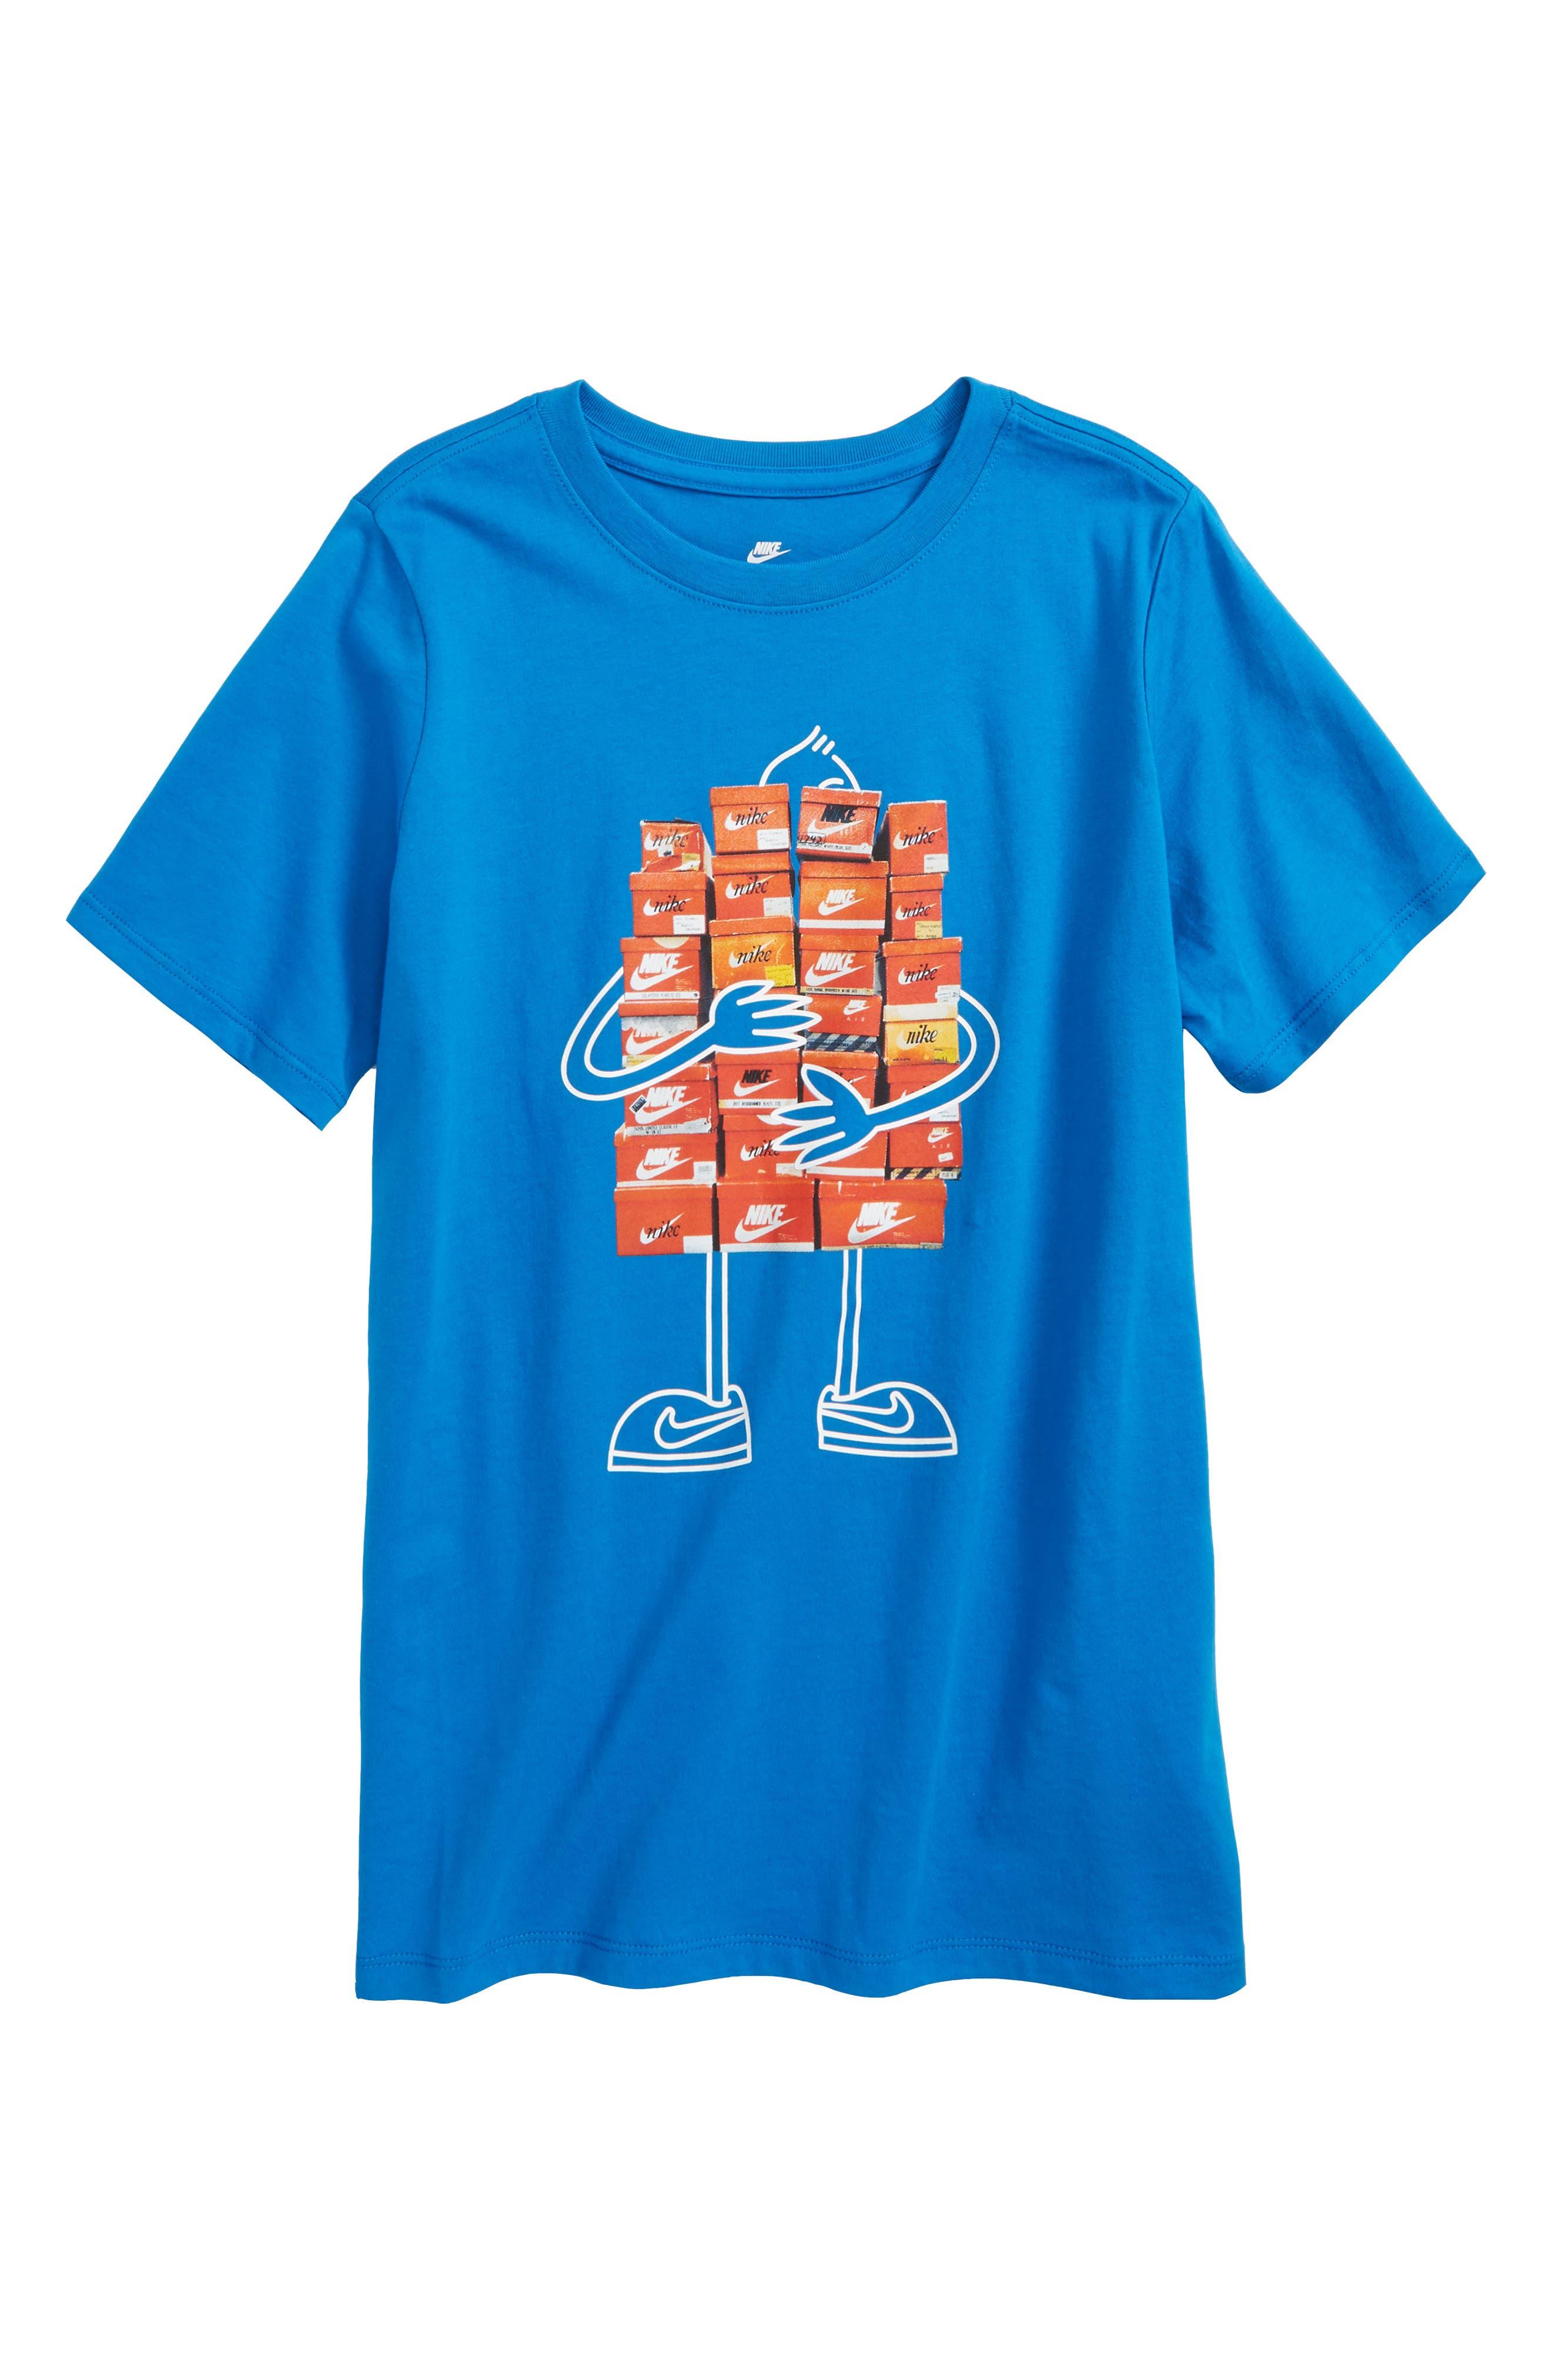 Sneaker Spree Graphic T-Shirt,                         Main,                         color, Blue Nebula